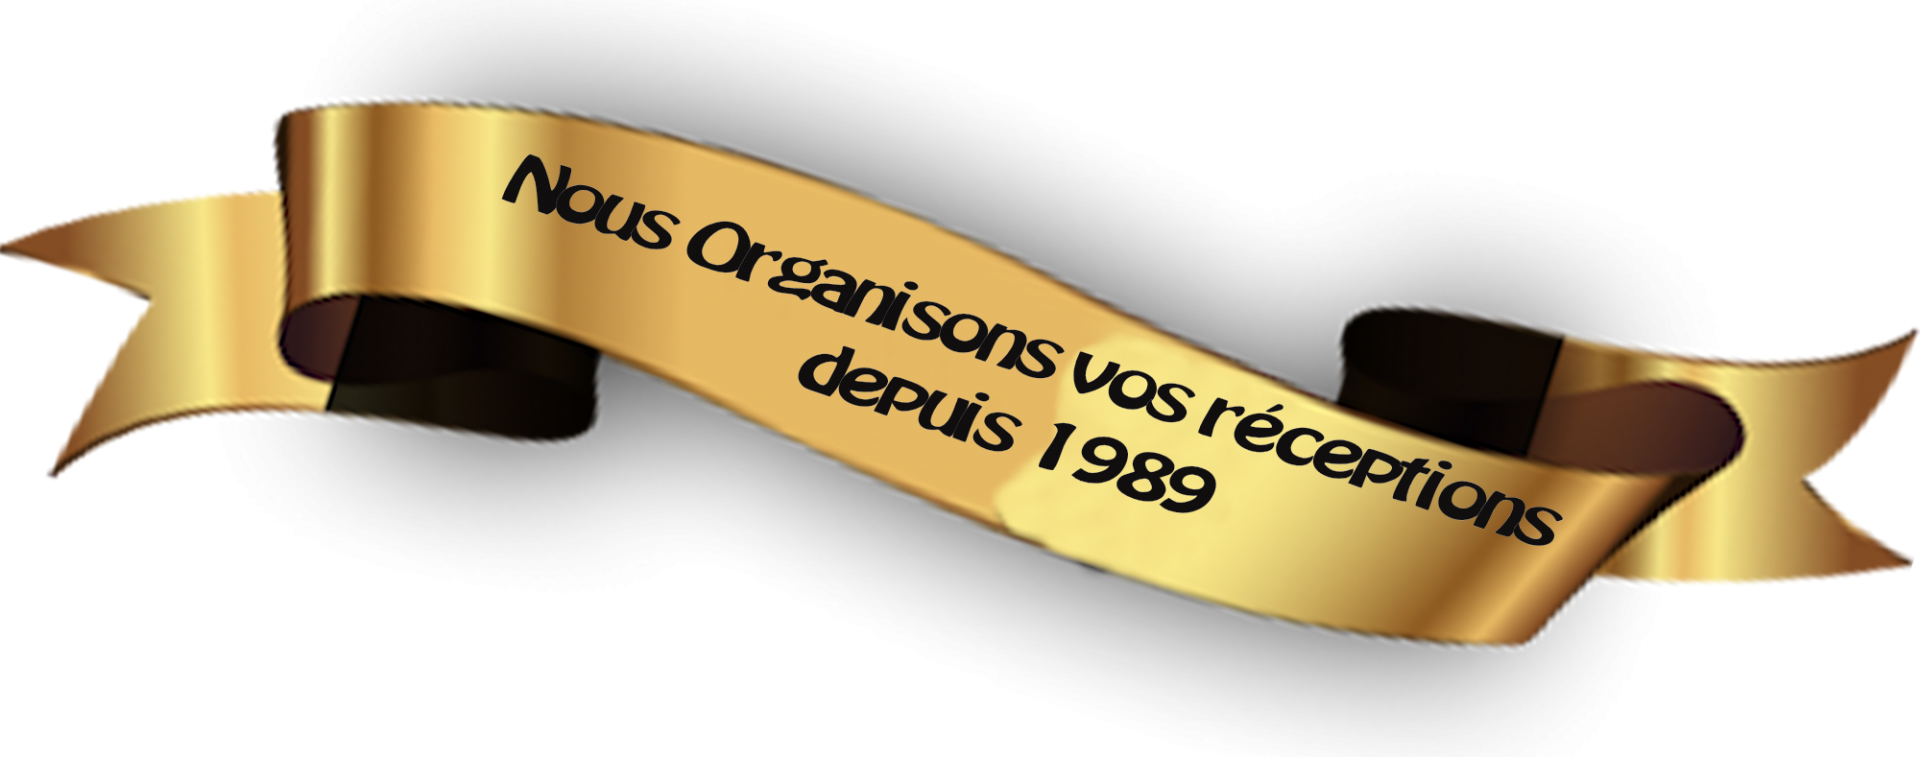 Since 1989 lw